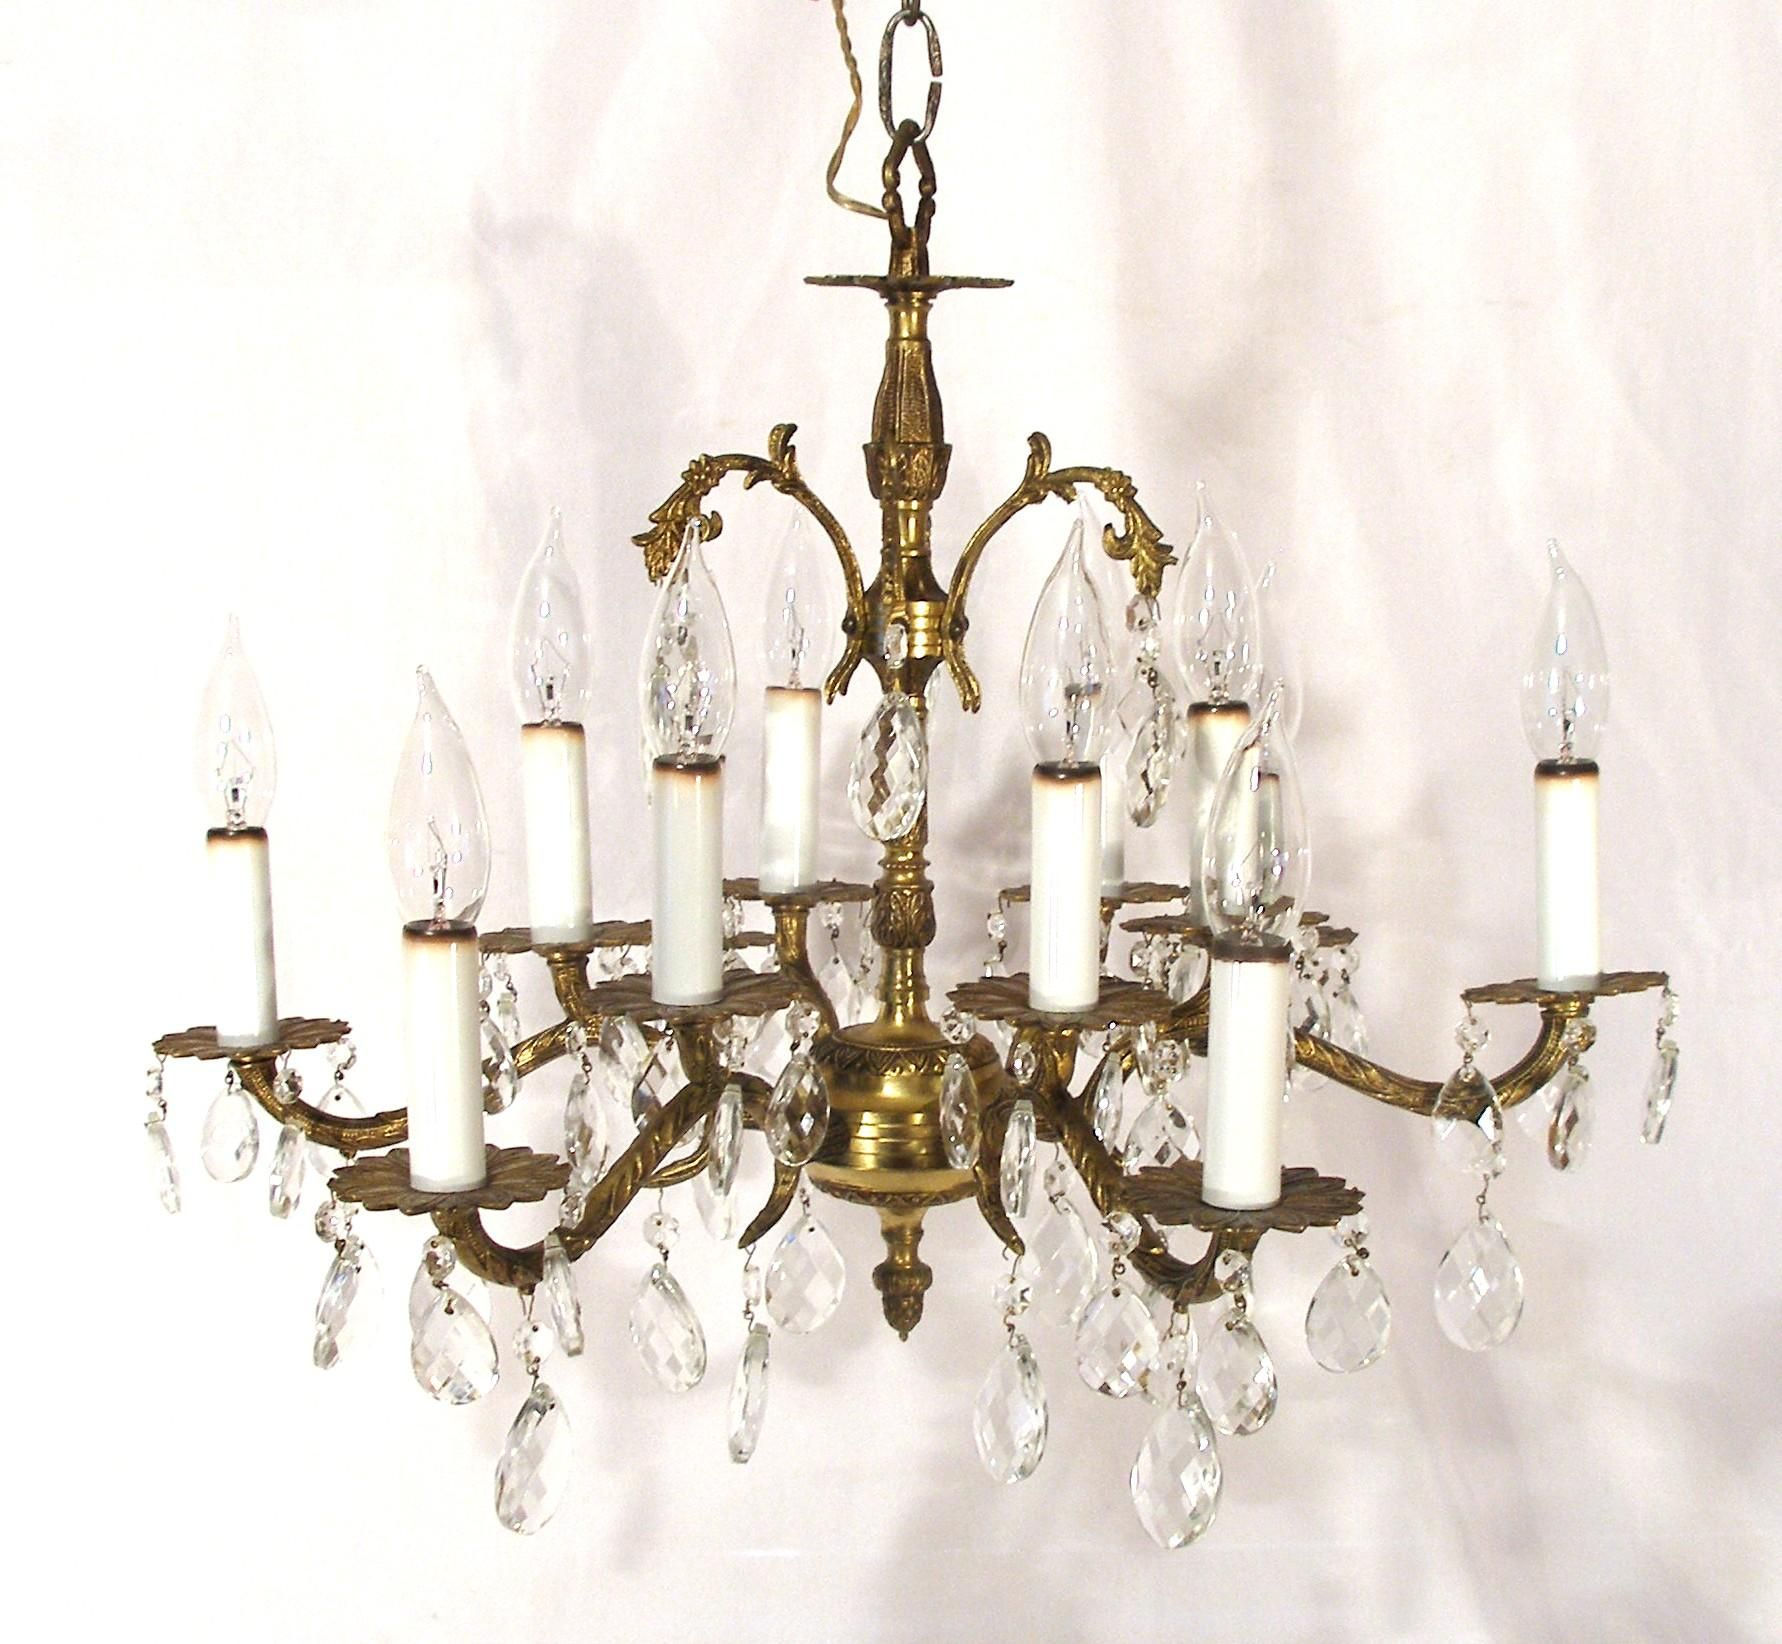 Vintage Victorian Art Nouveau Style 12 Light Brass Candelabra Crystal Chandelier Victorian Art Crystal Chandelier Art Nouveau